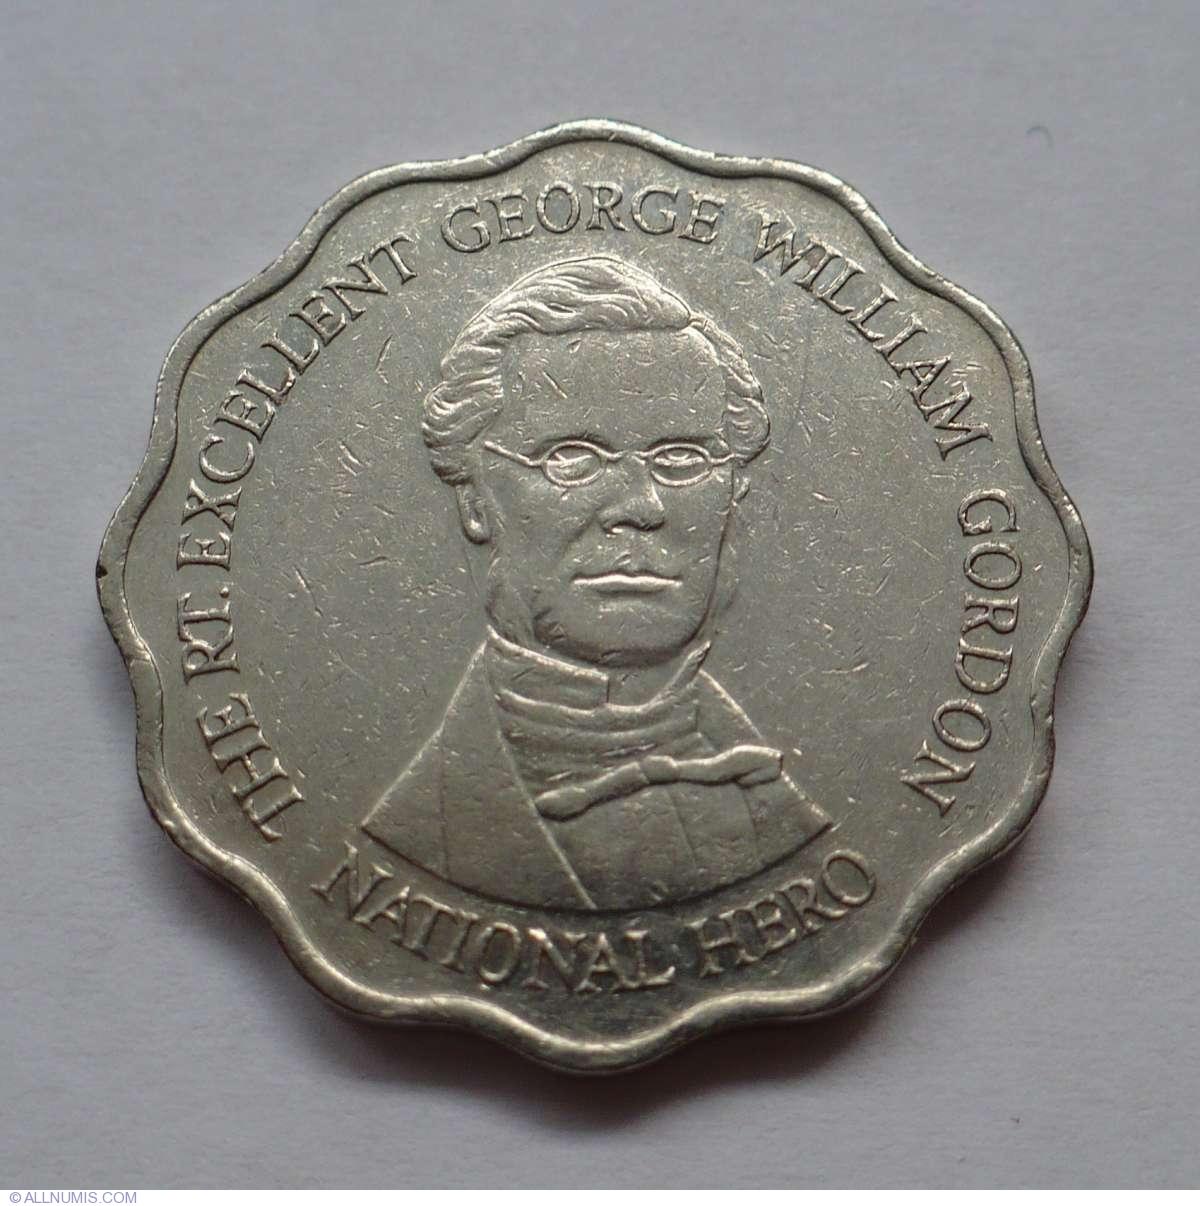 10 Dollars 1999